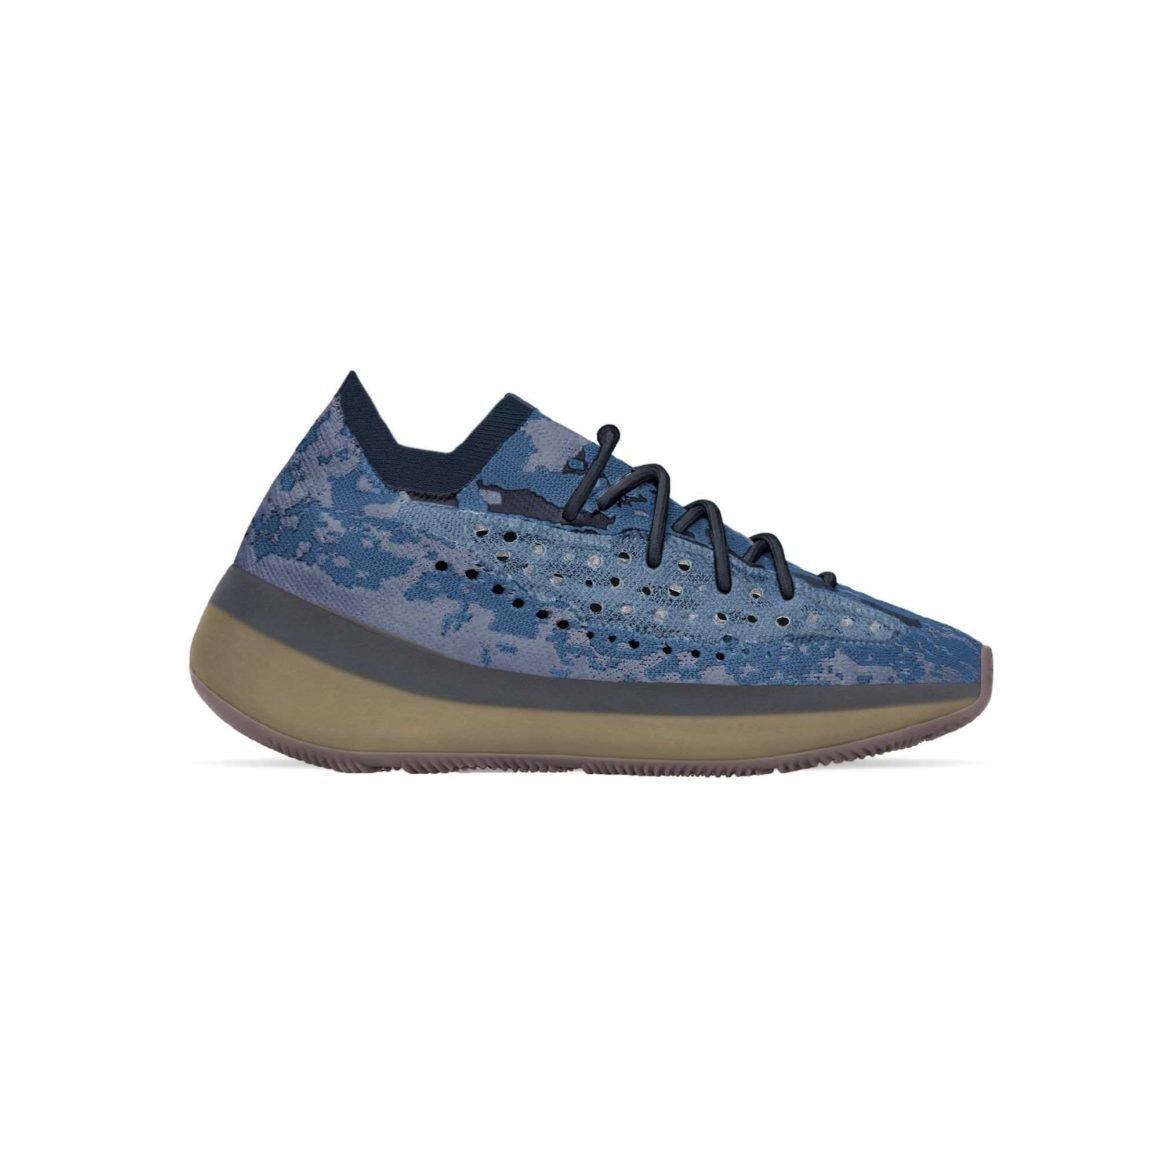 adidas-YEEZY-380-Boost-covelite-Release-2021 (1)